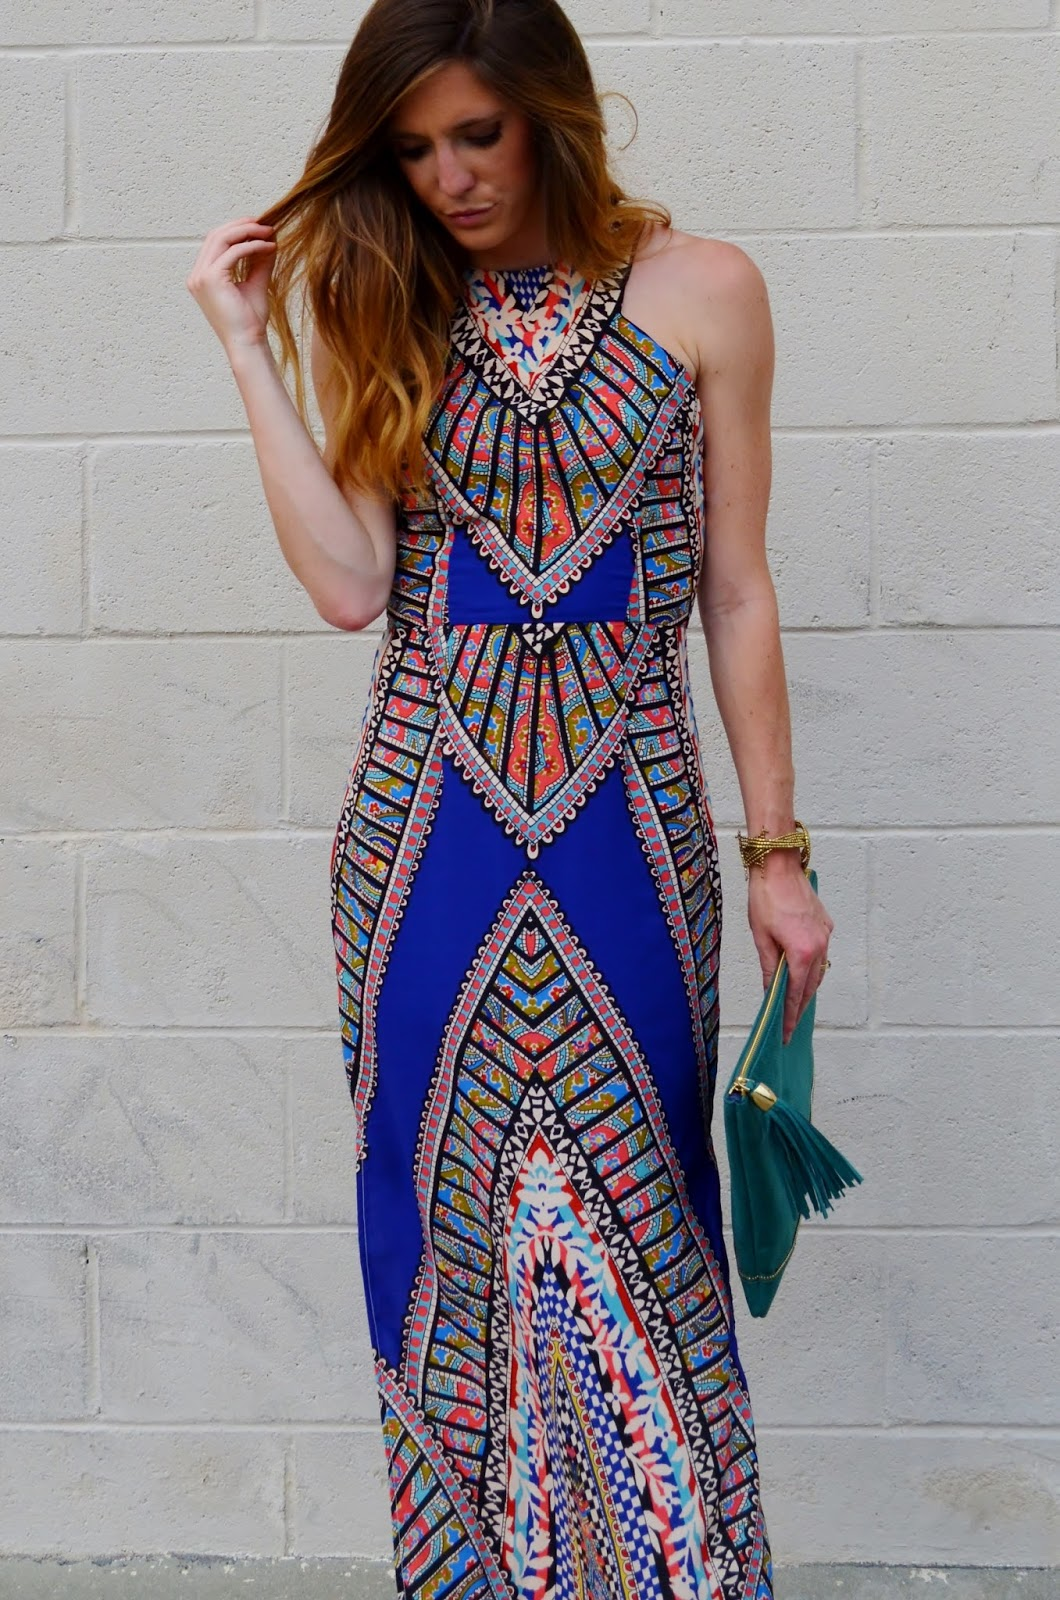 3 in 1 maxi dress dillards – Dress best style blog